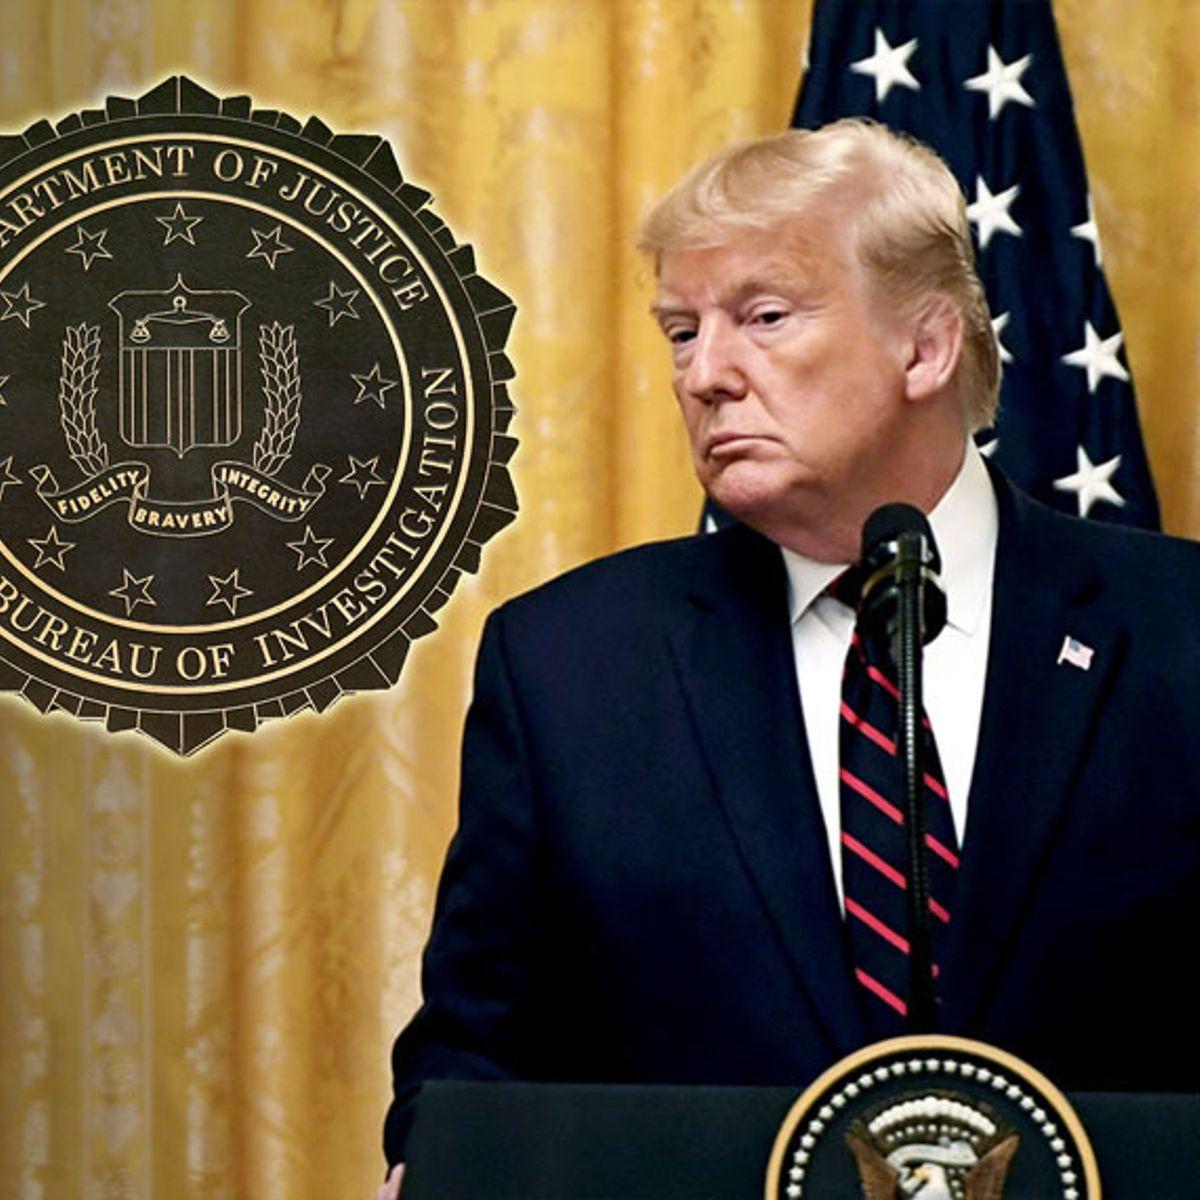 fbi document national security concerns